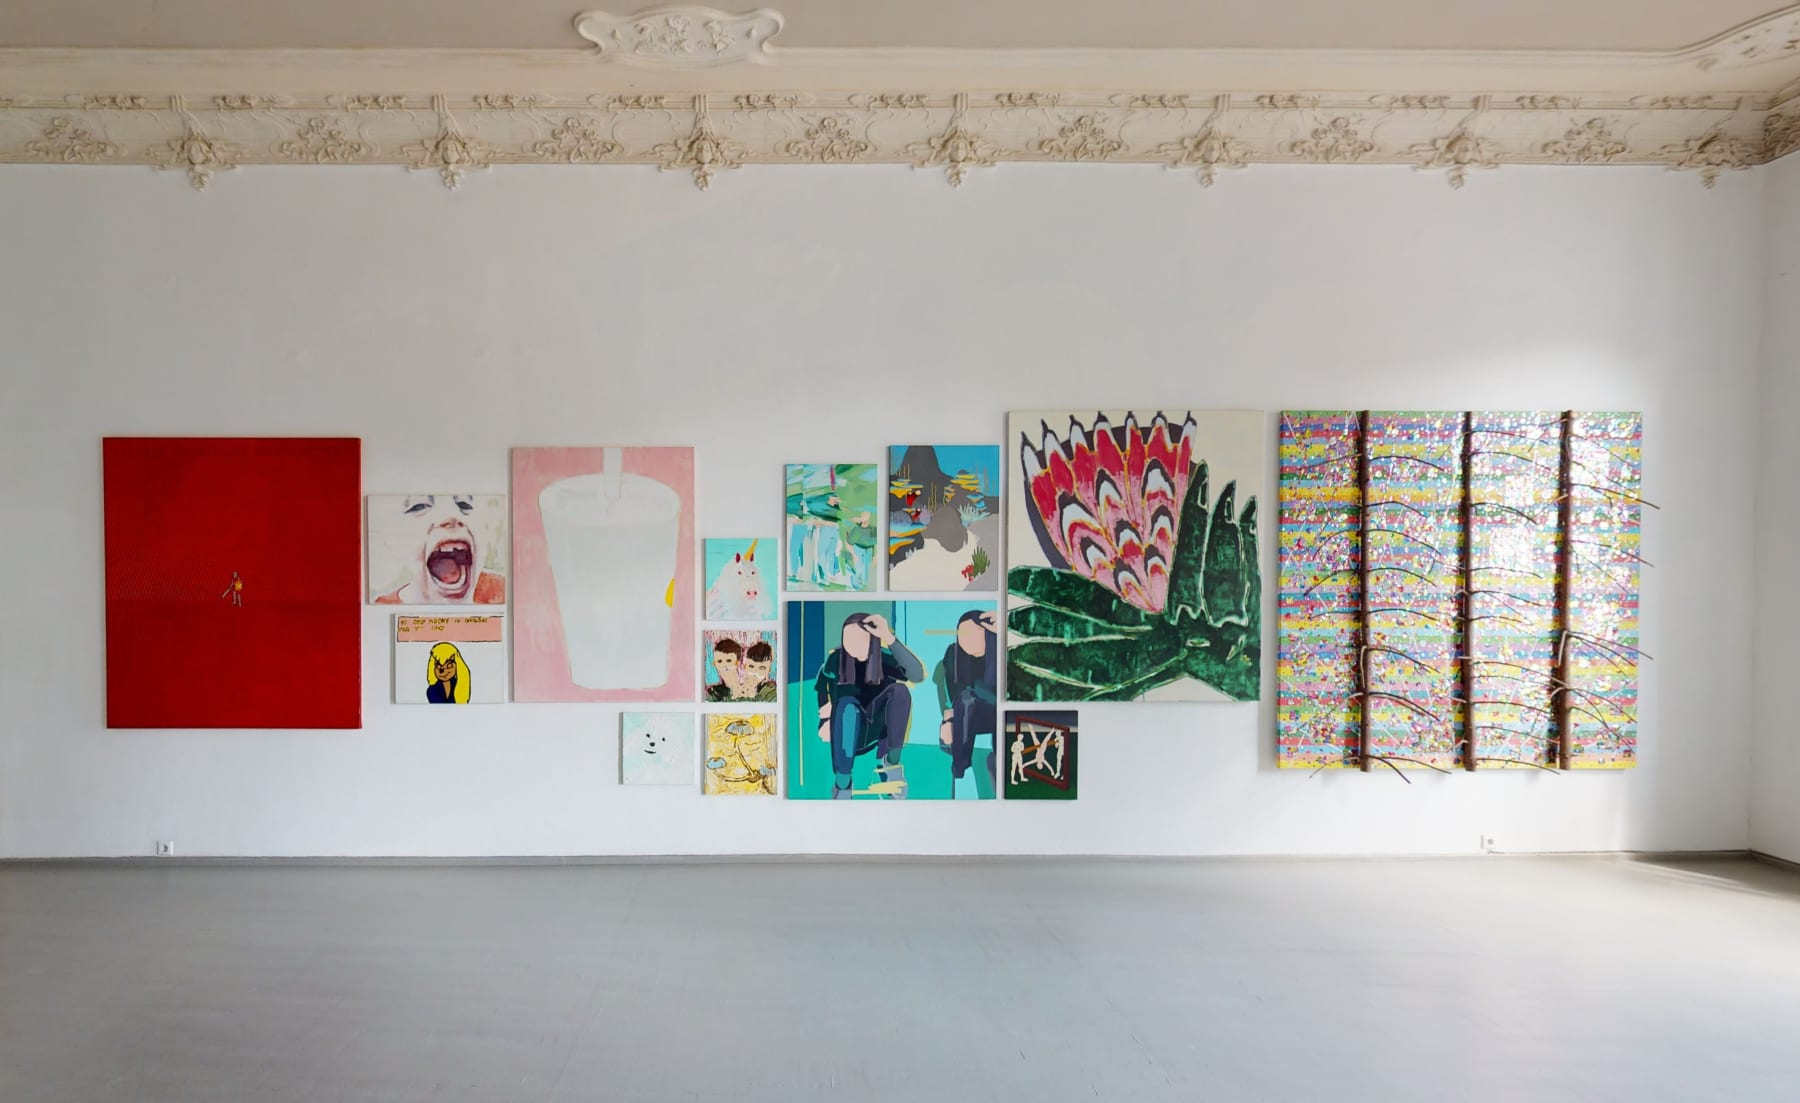 Galerija Vartai, 2020 Installation shot from group exhibition